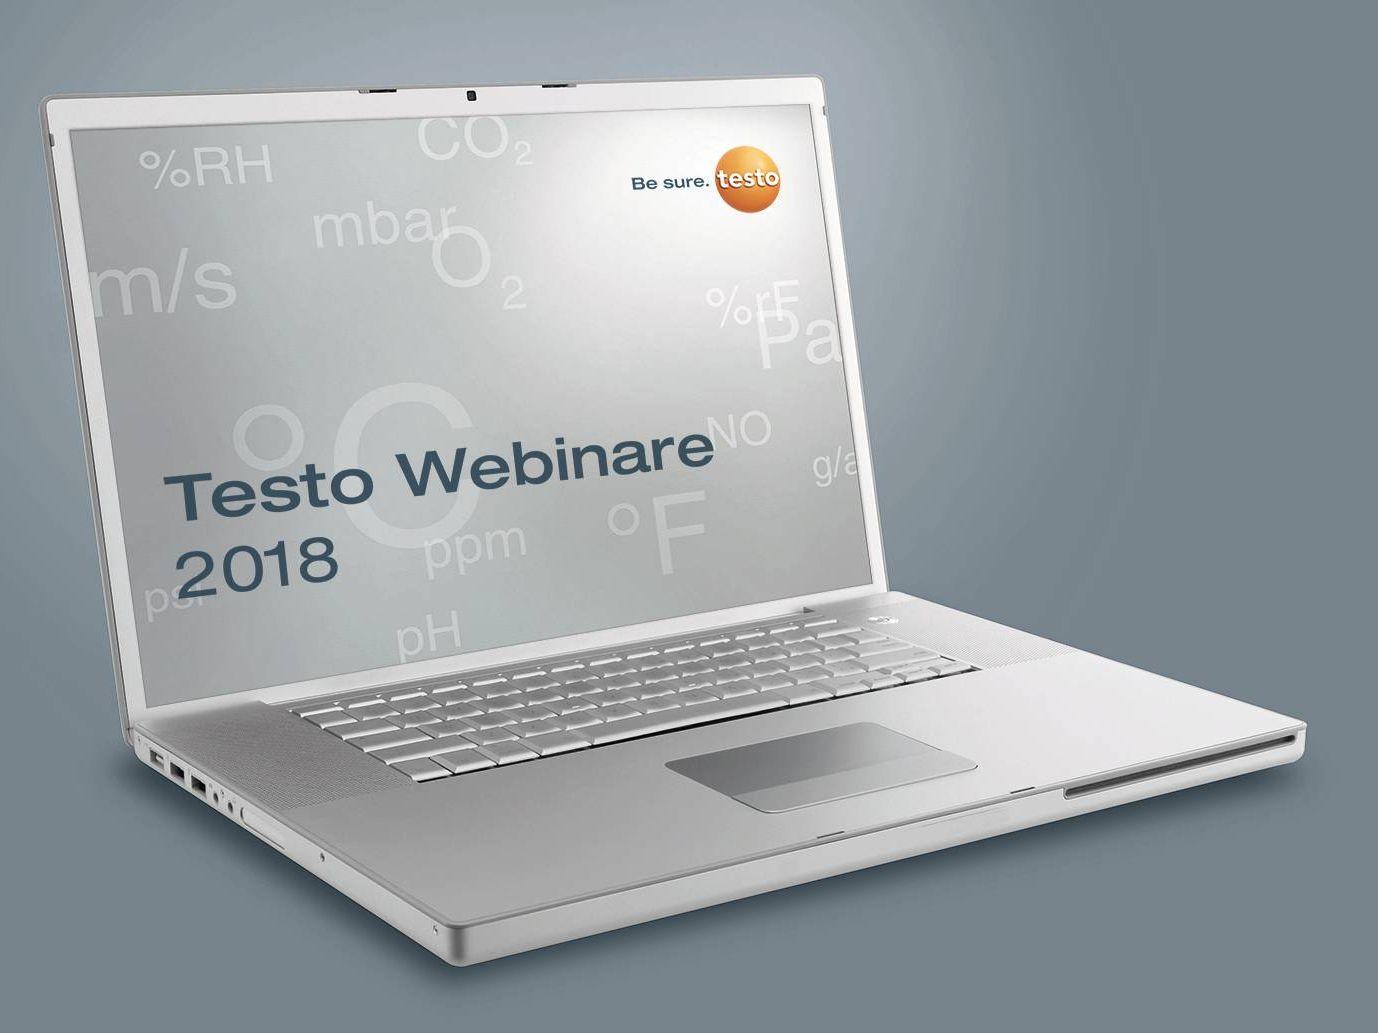 Testo Webinarprogramm SHK, Industrie, Pharma